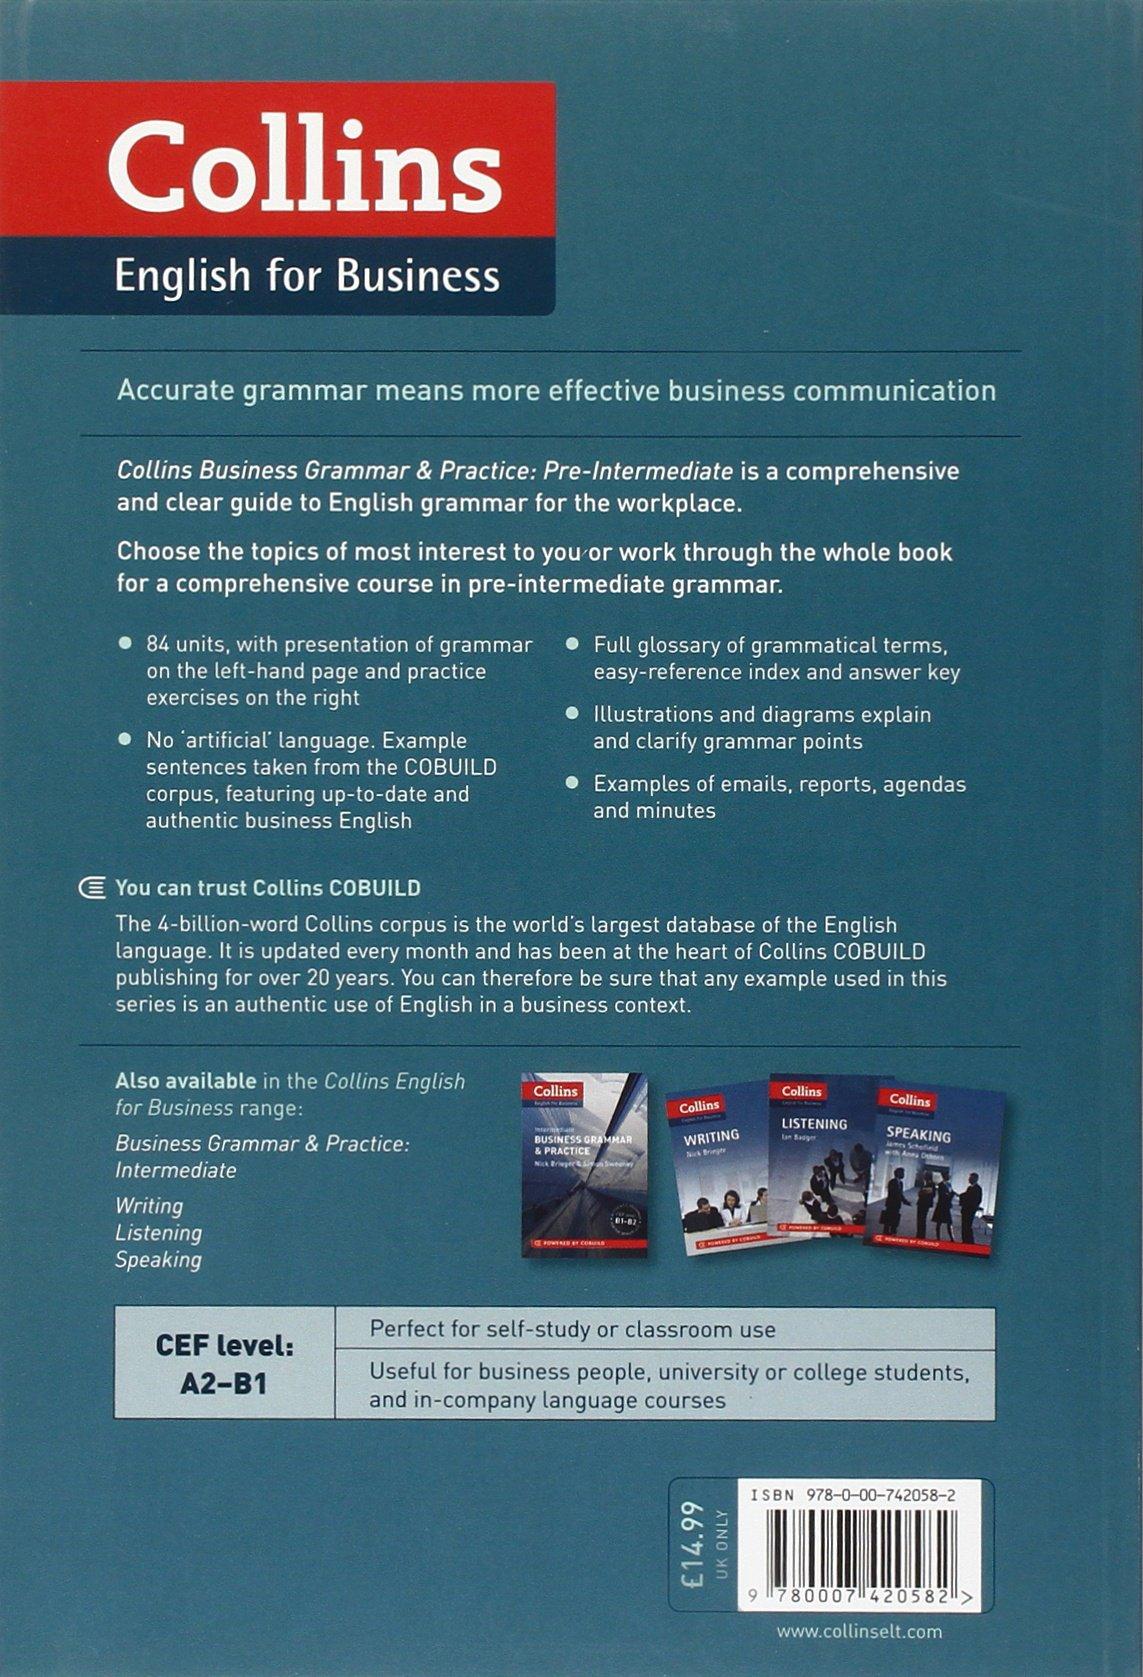 Business Grammar & Practice: A2-B1 (Collins Business Grammar